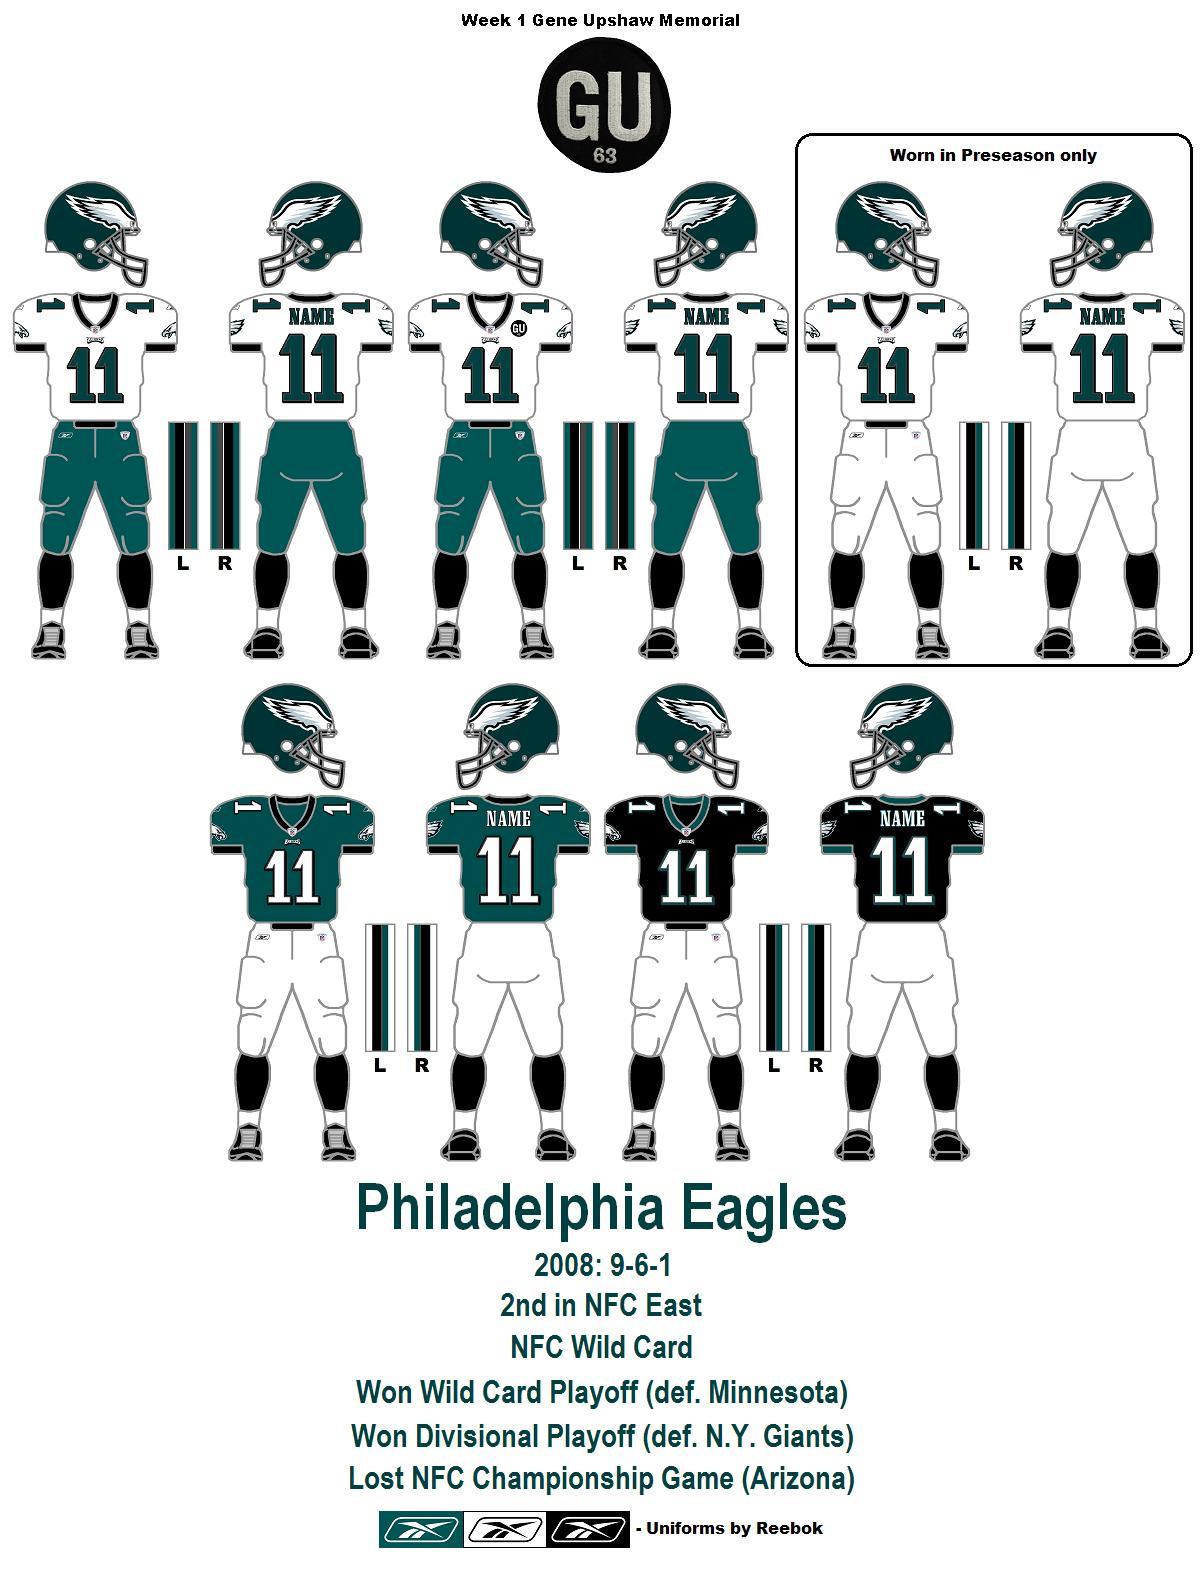 2008 Eagles